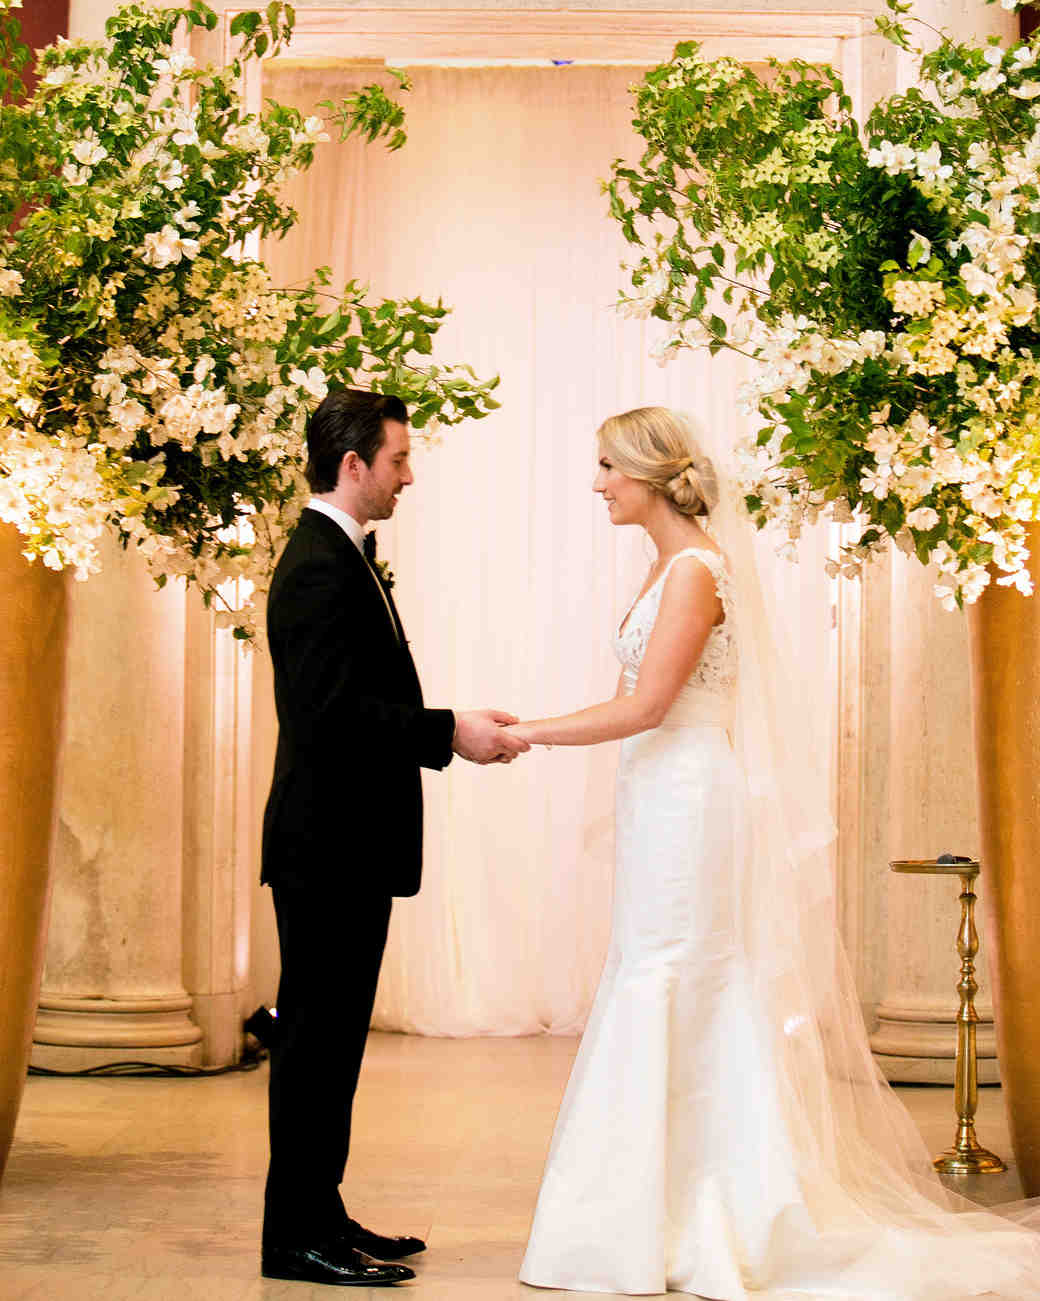 Lad wedding